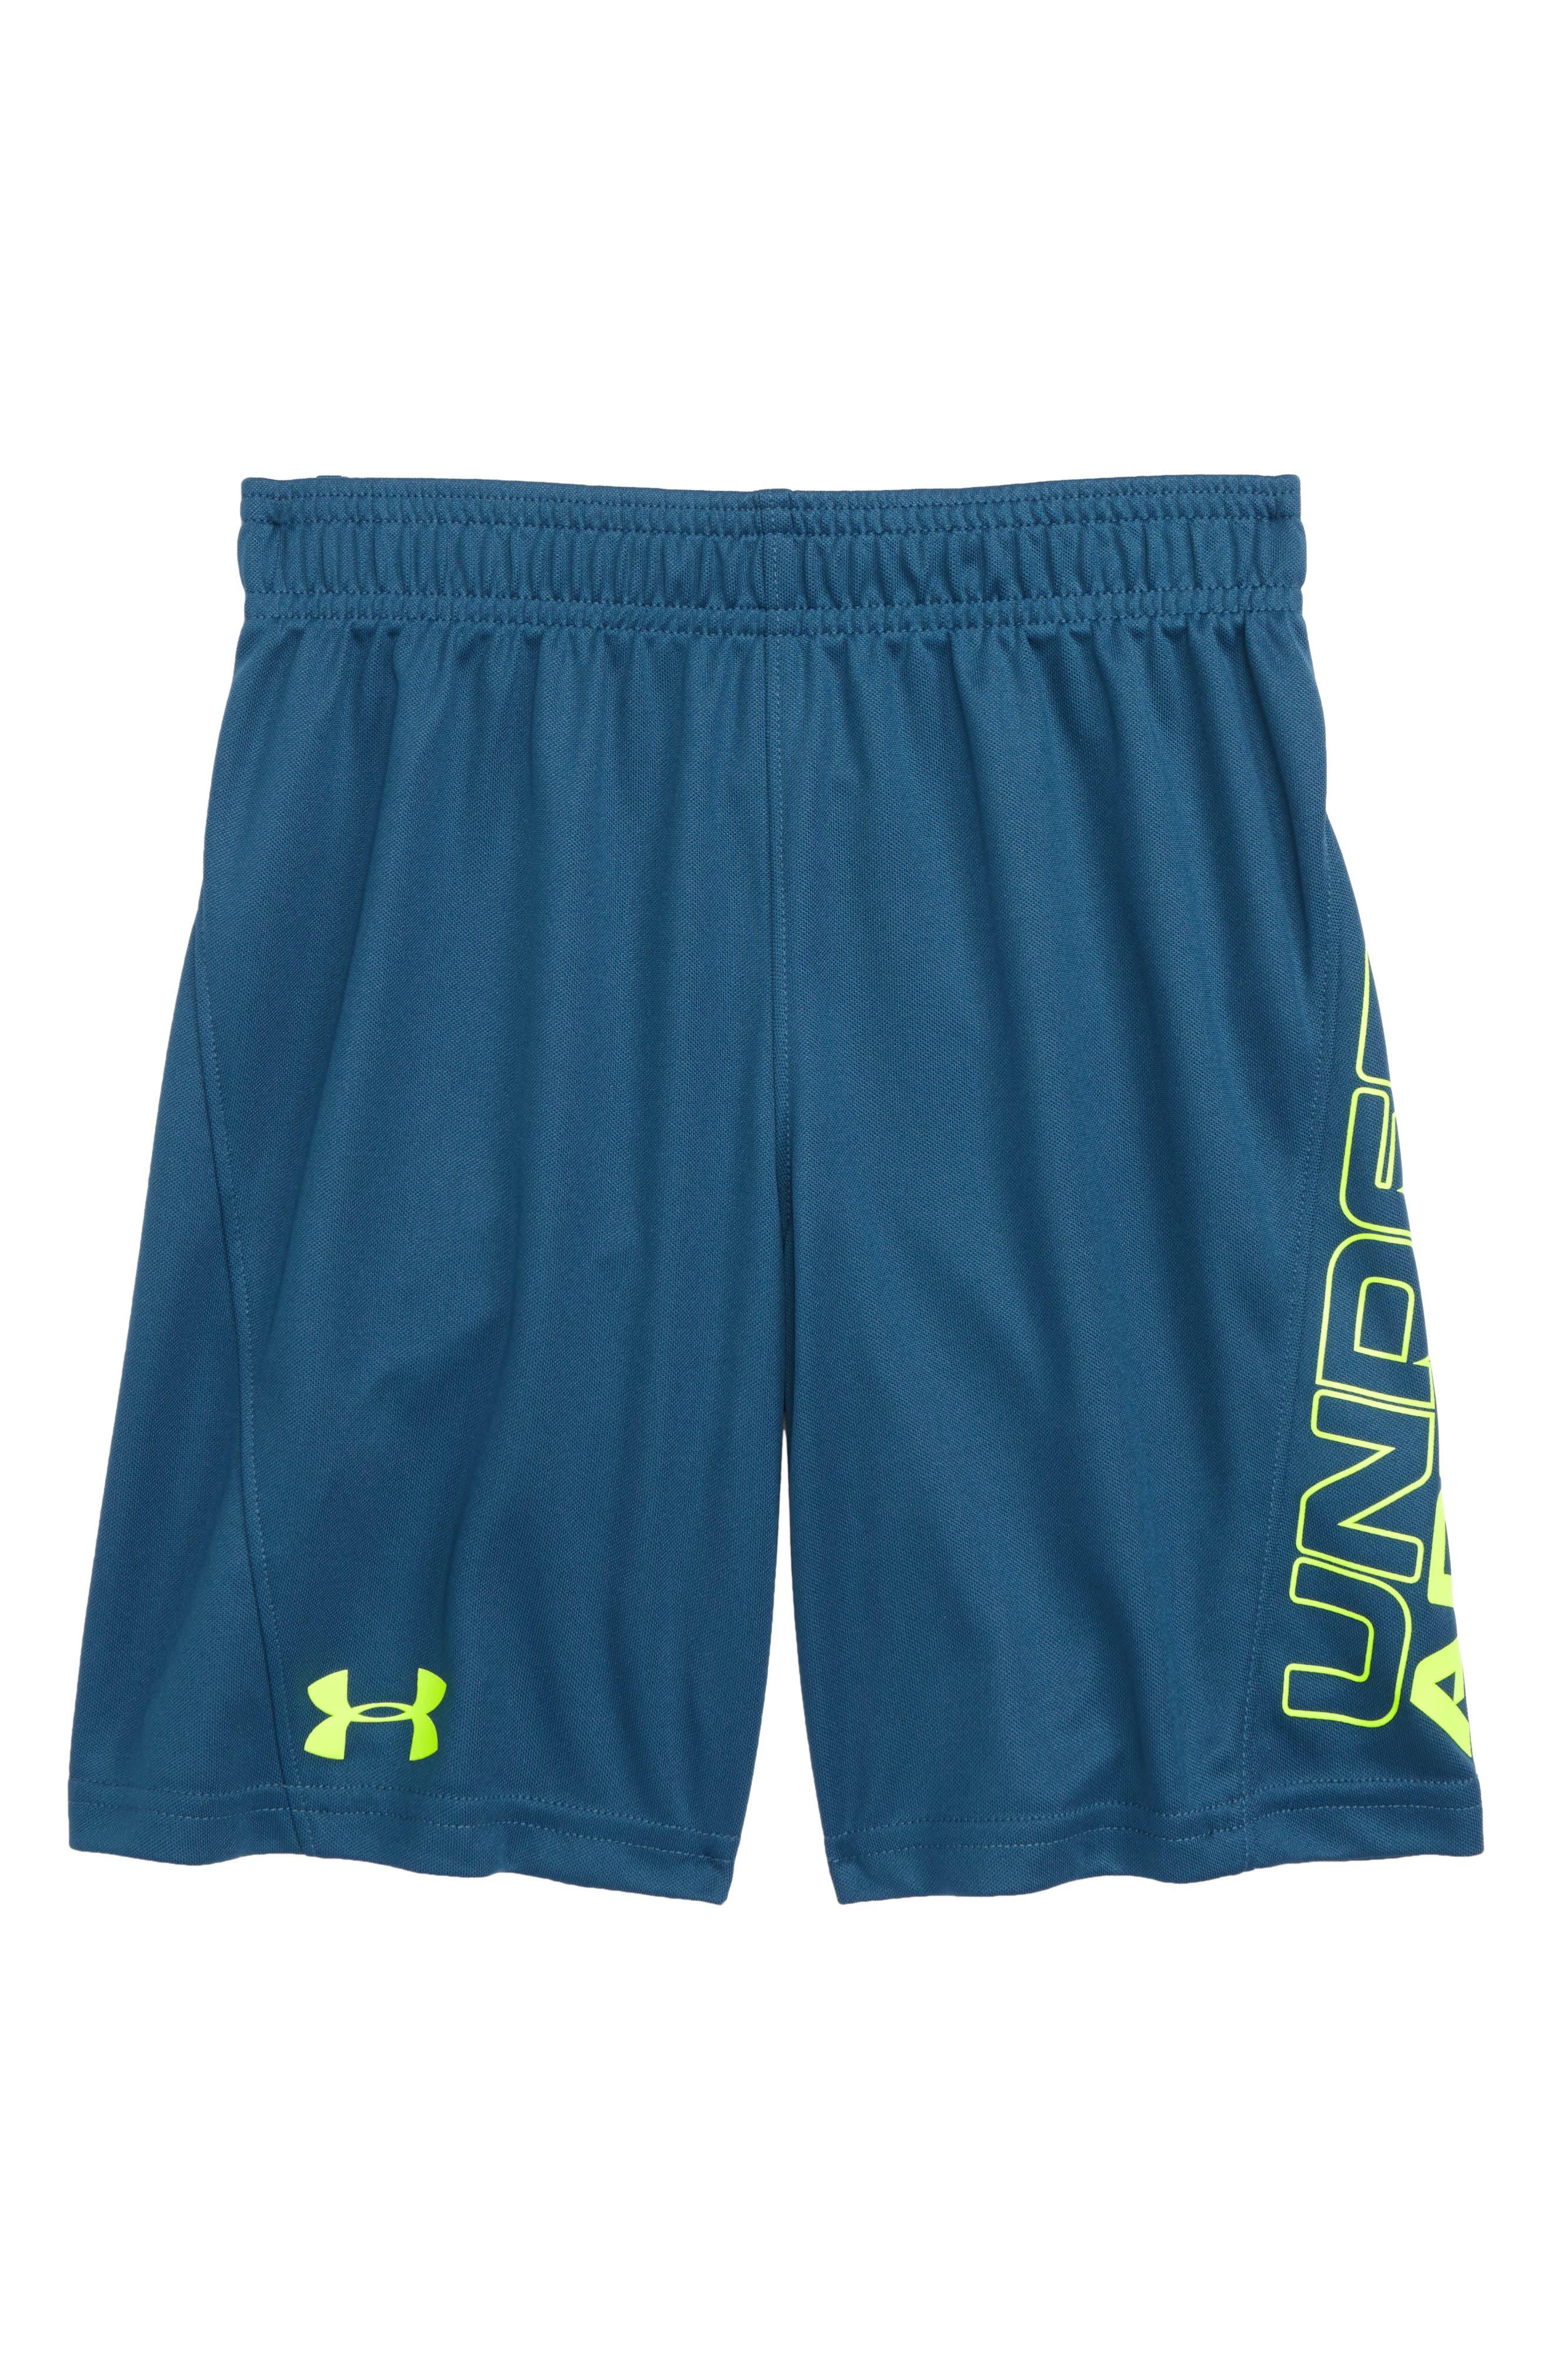 UNDER ARMOUR,                             Kick Off HeatGear<sup>®</sup> Athletic Shorts,                             Main thumbnail 1, color,                             PETROL BLUE